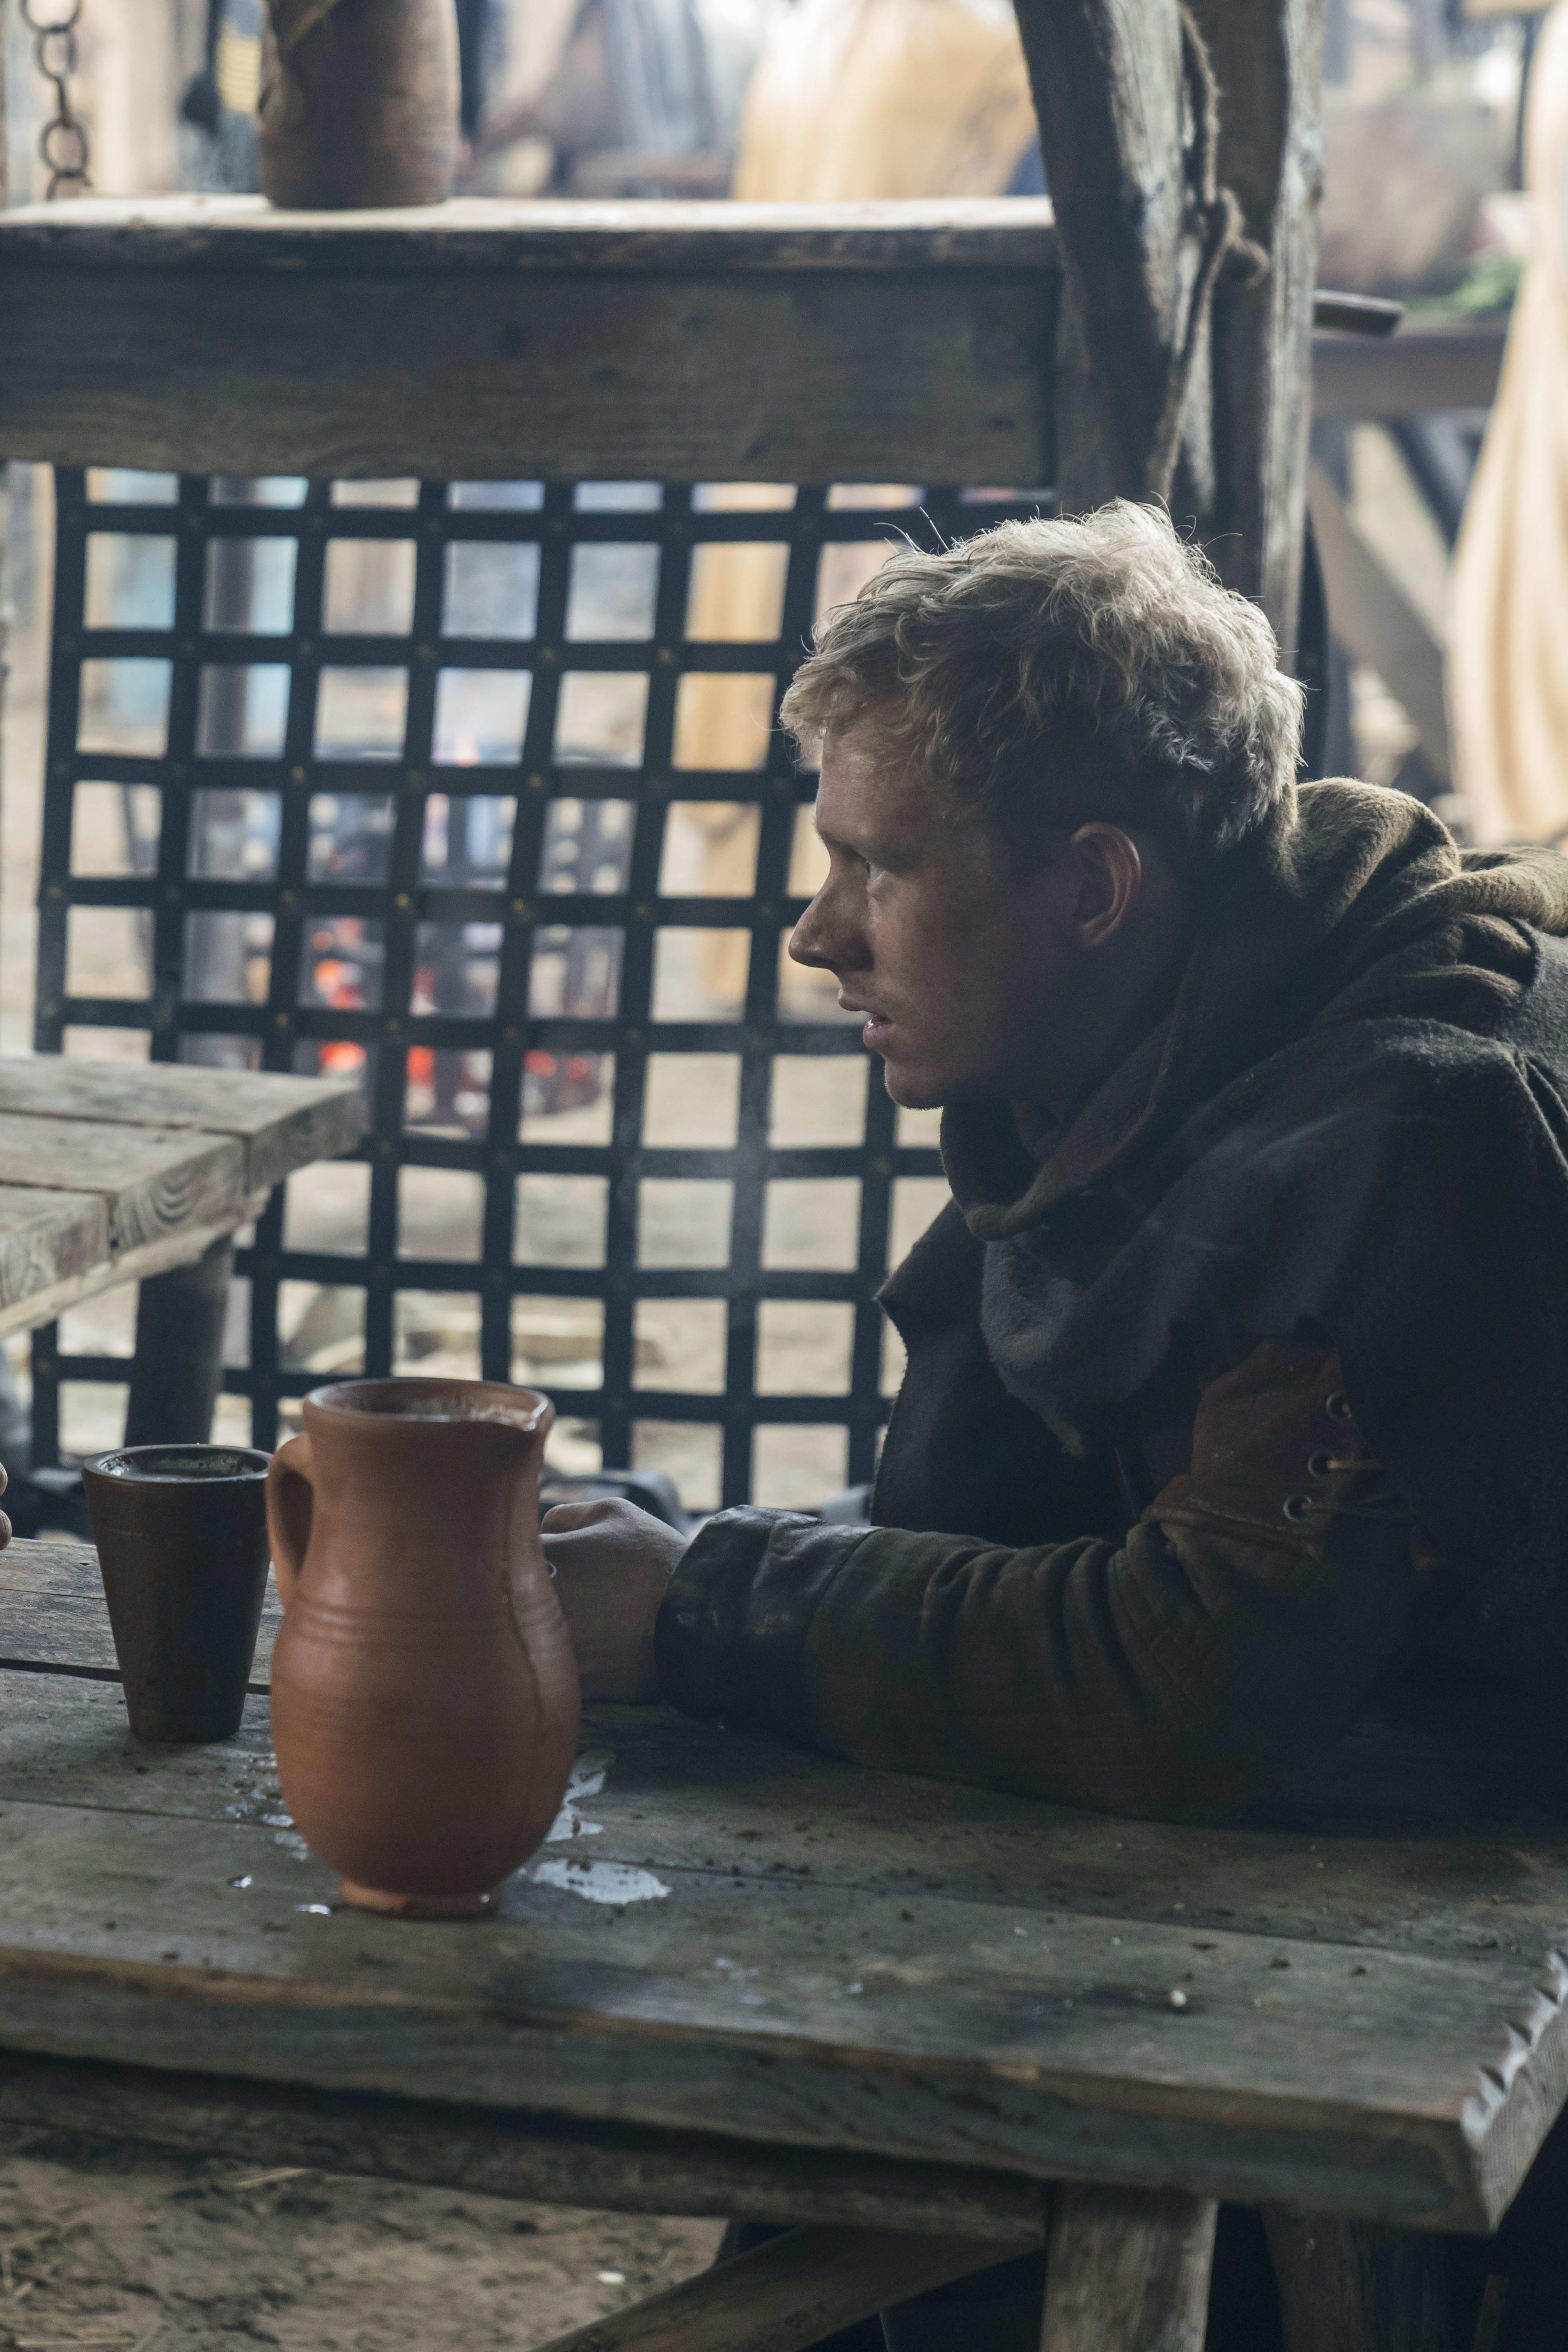 Vikings Season 5 Episode 13 - TV Fanatic